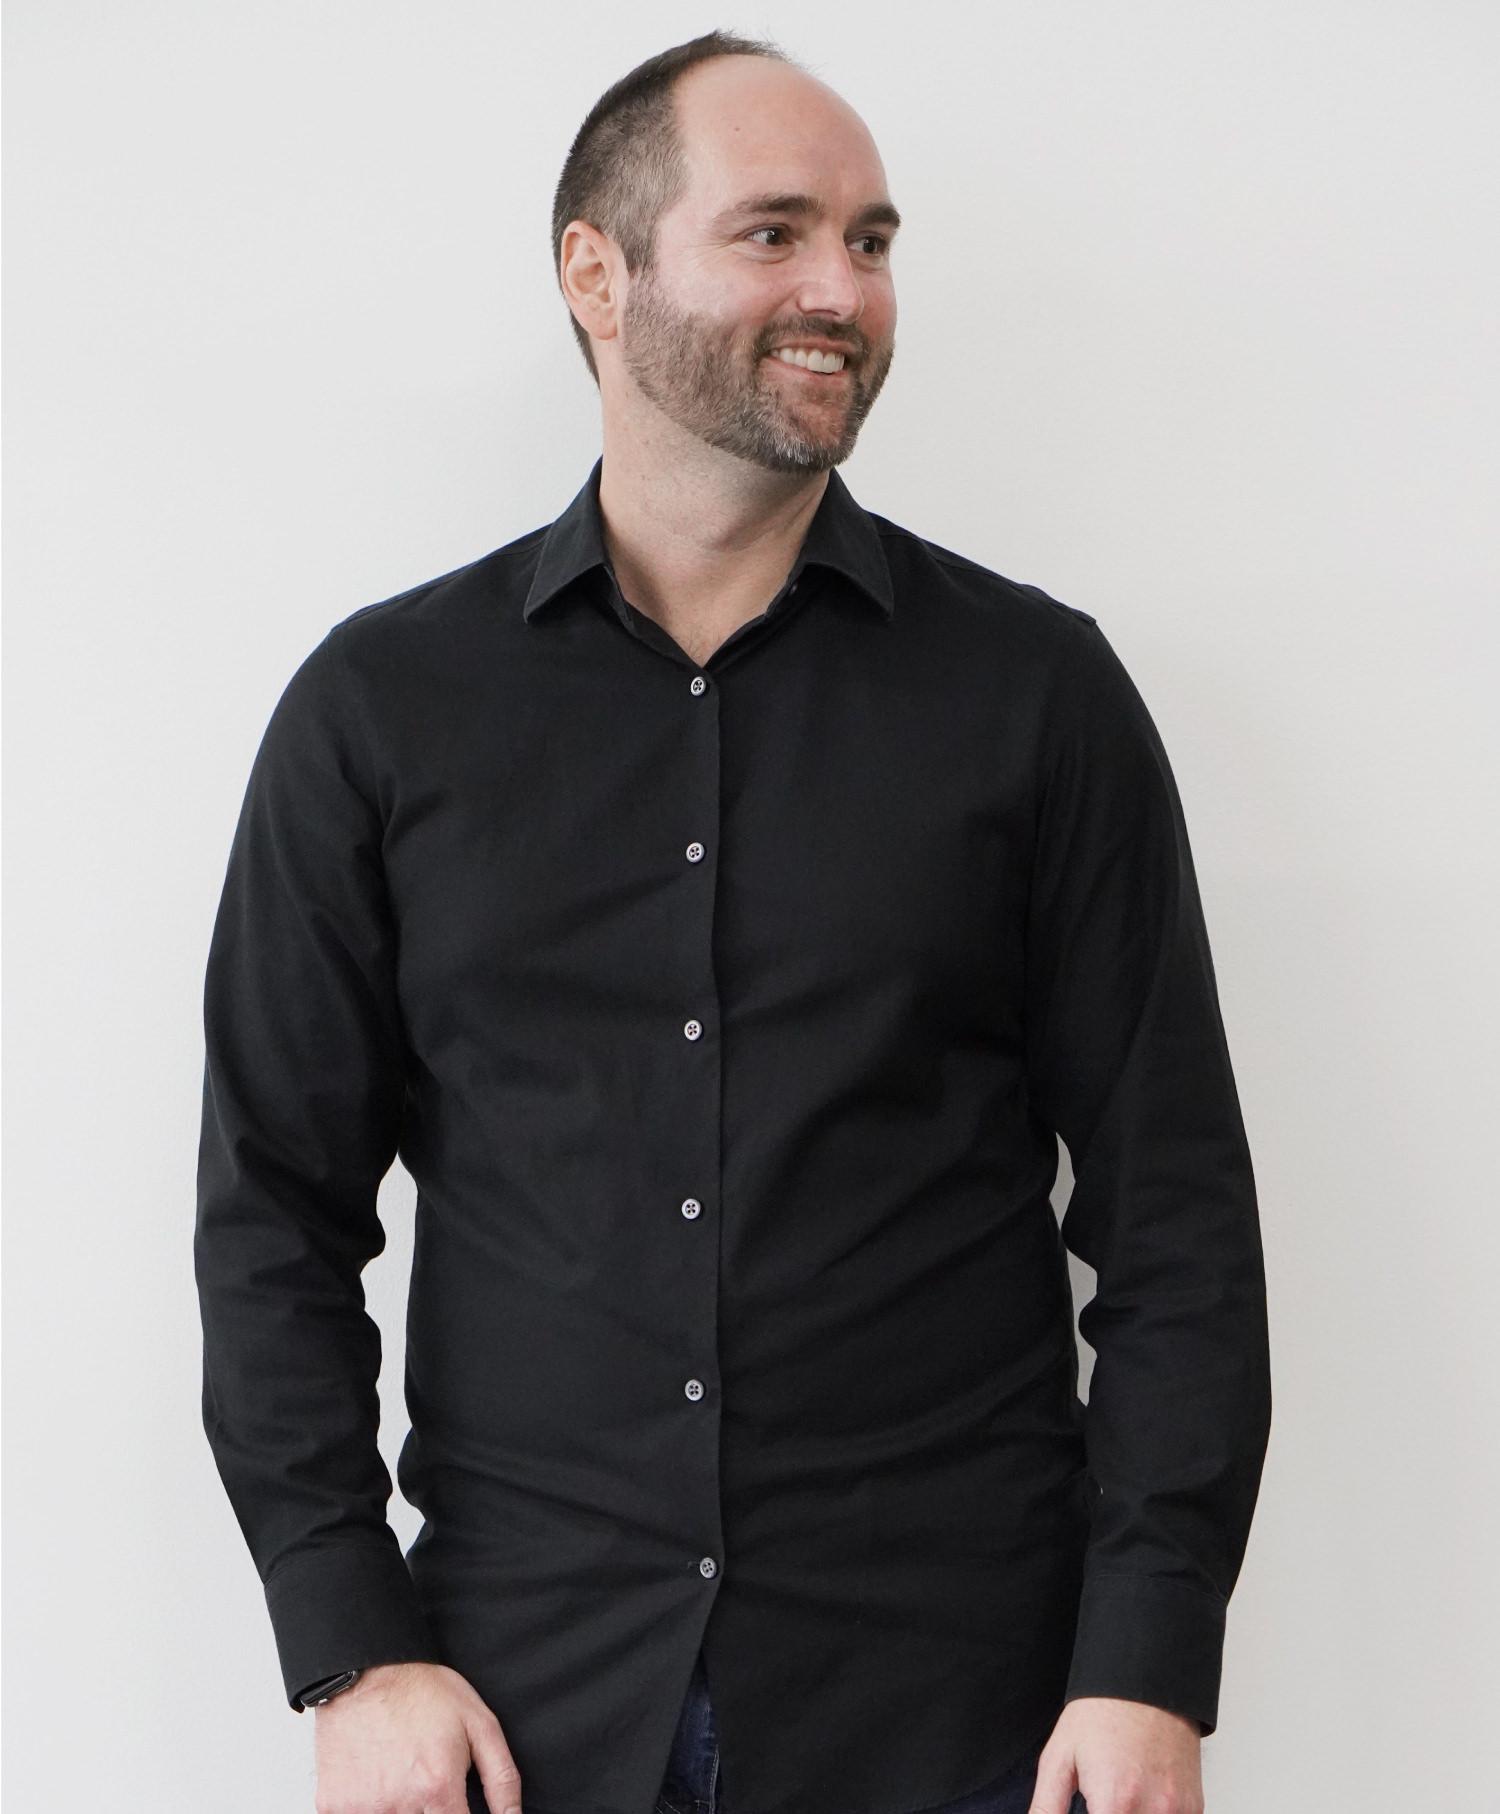 Daniel-Midson-Short-Sia-Brands-Orange-County-Brand-Positioning.jpg